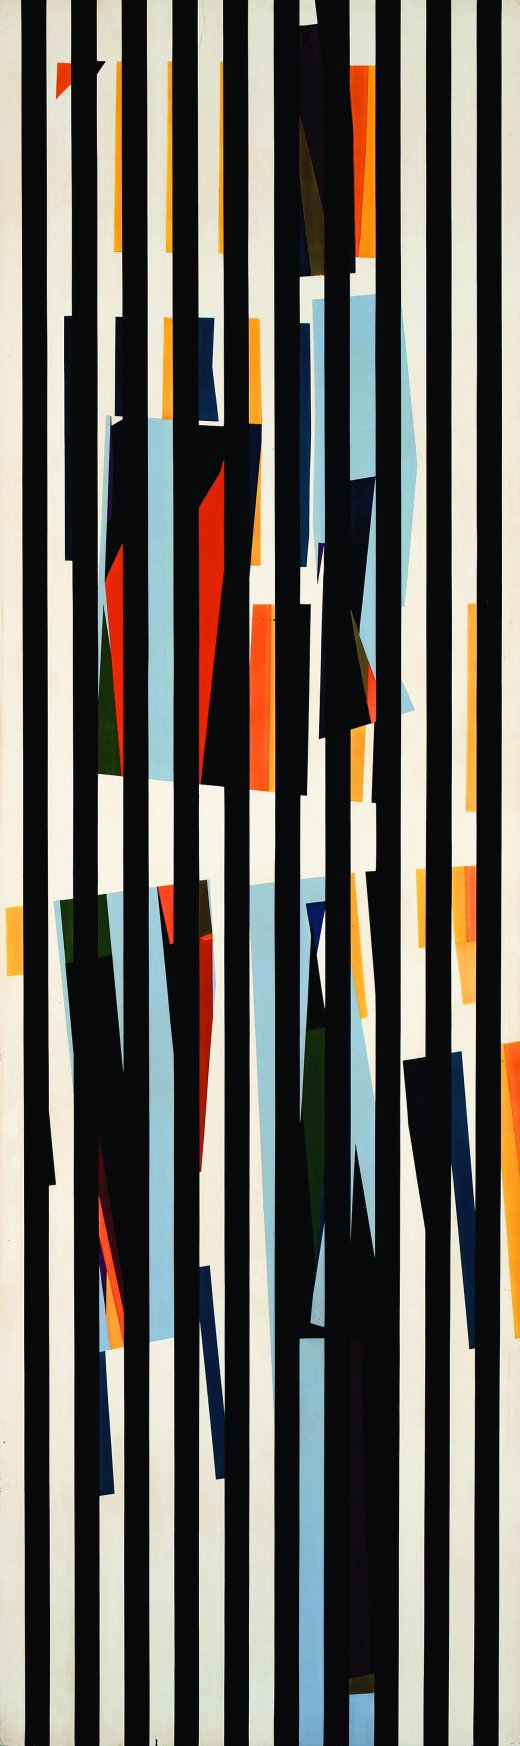 Coloritmo #41 (1959) - Alejandro Otero